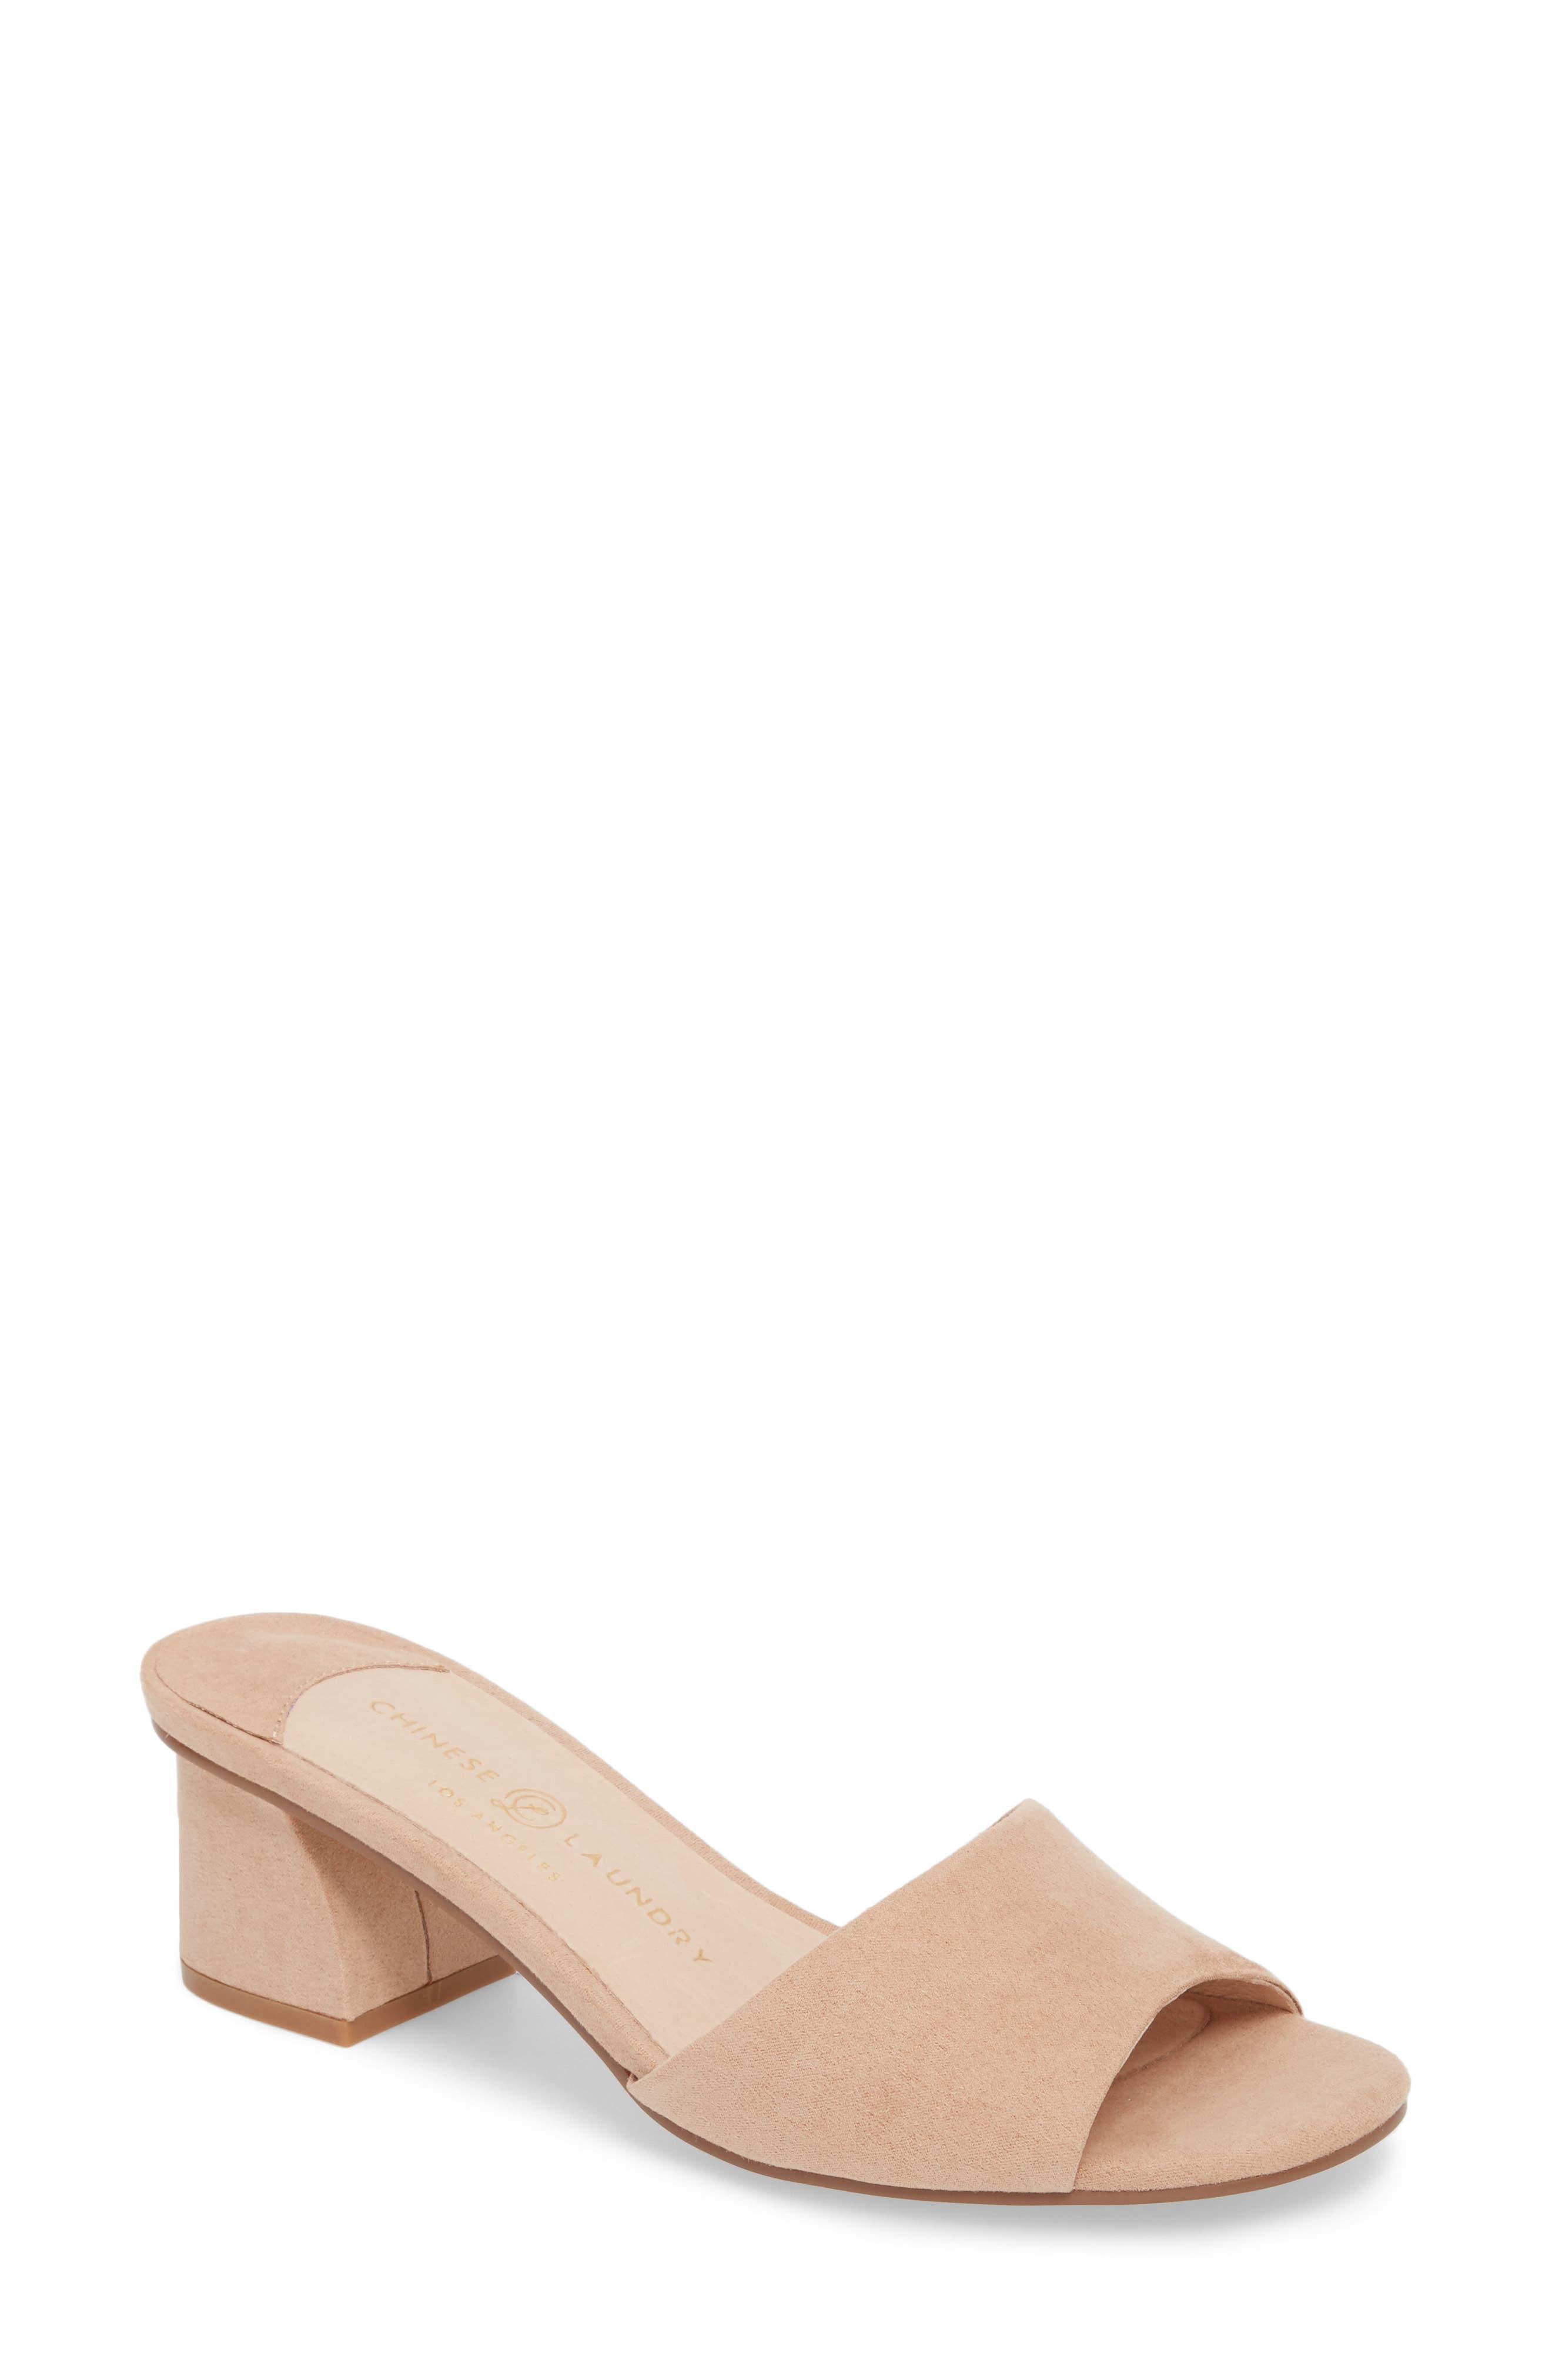 My Girl Slide Sandal,                         Main,                         color, Beige